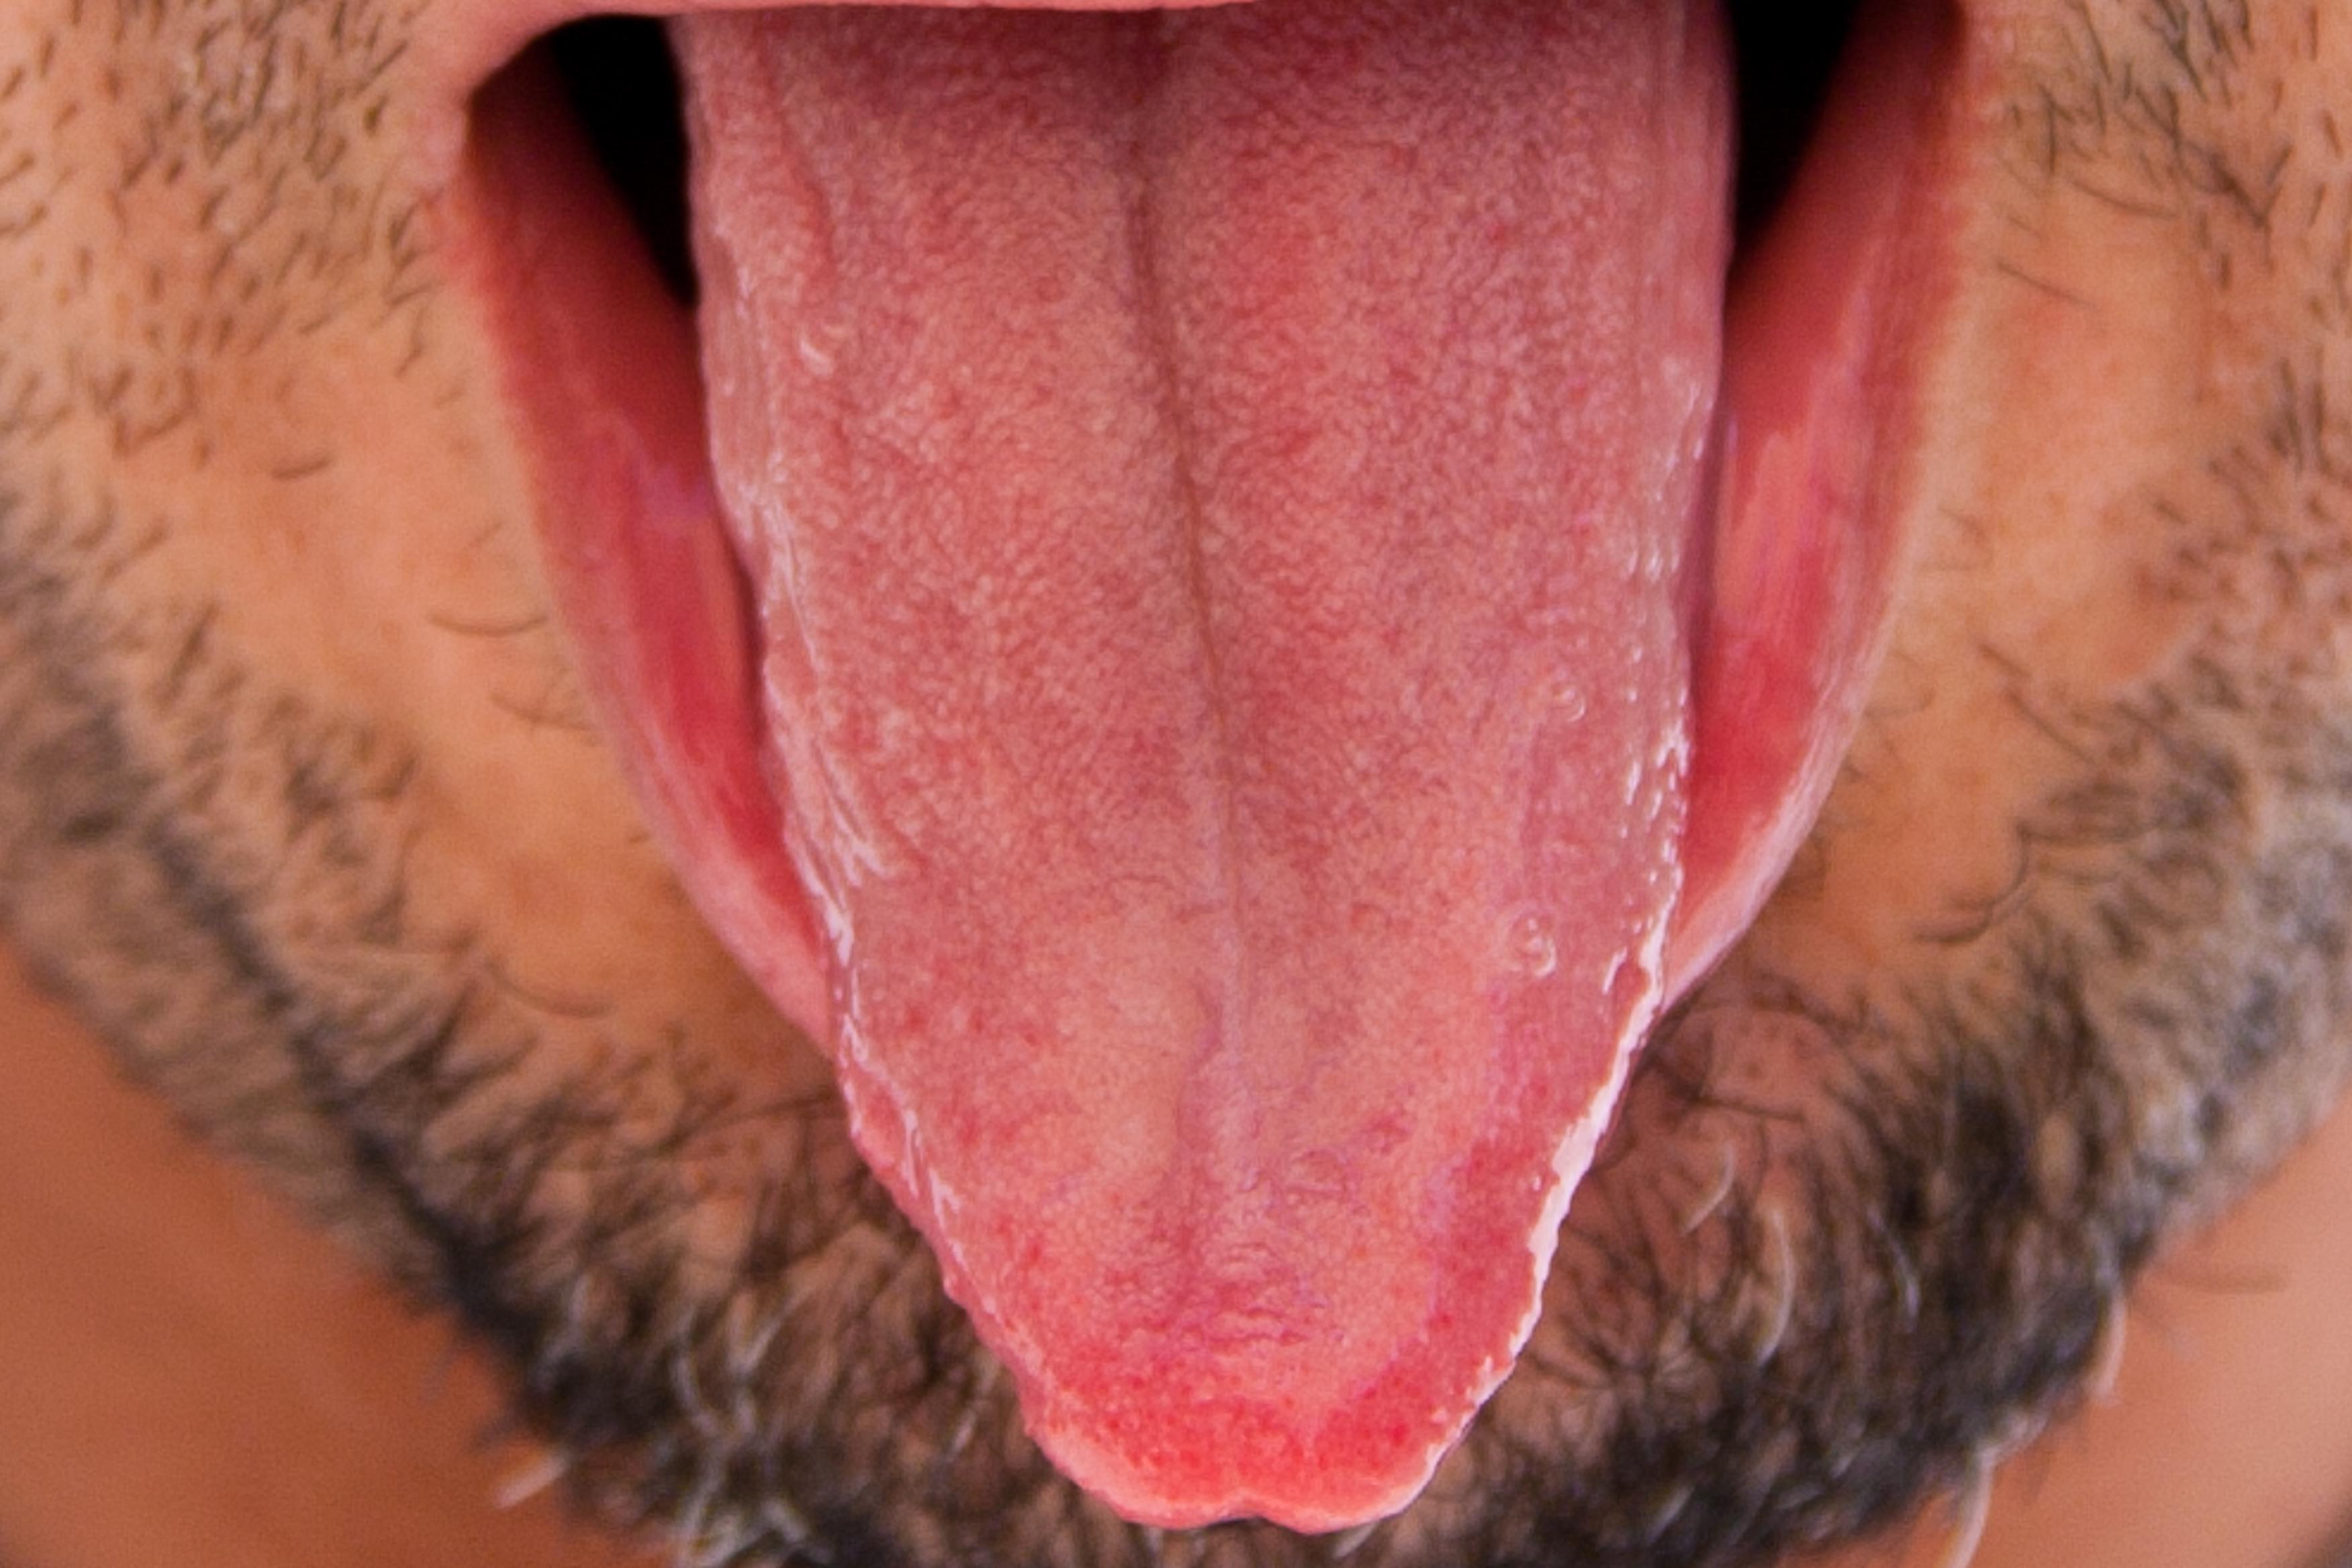 Pimple-Like Bumps on the Tongue